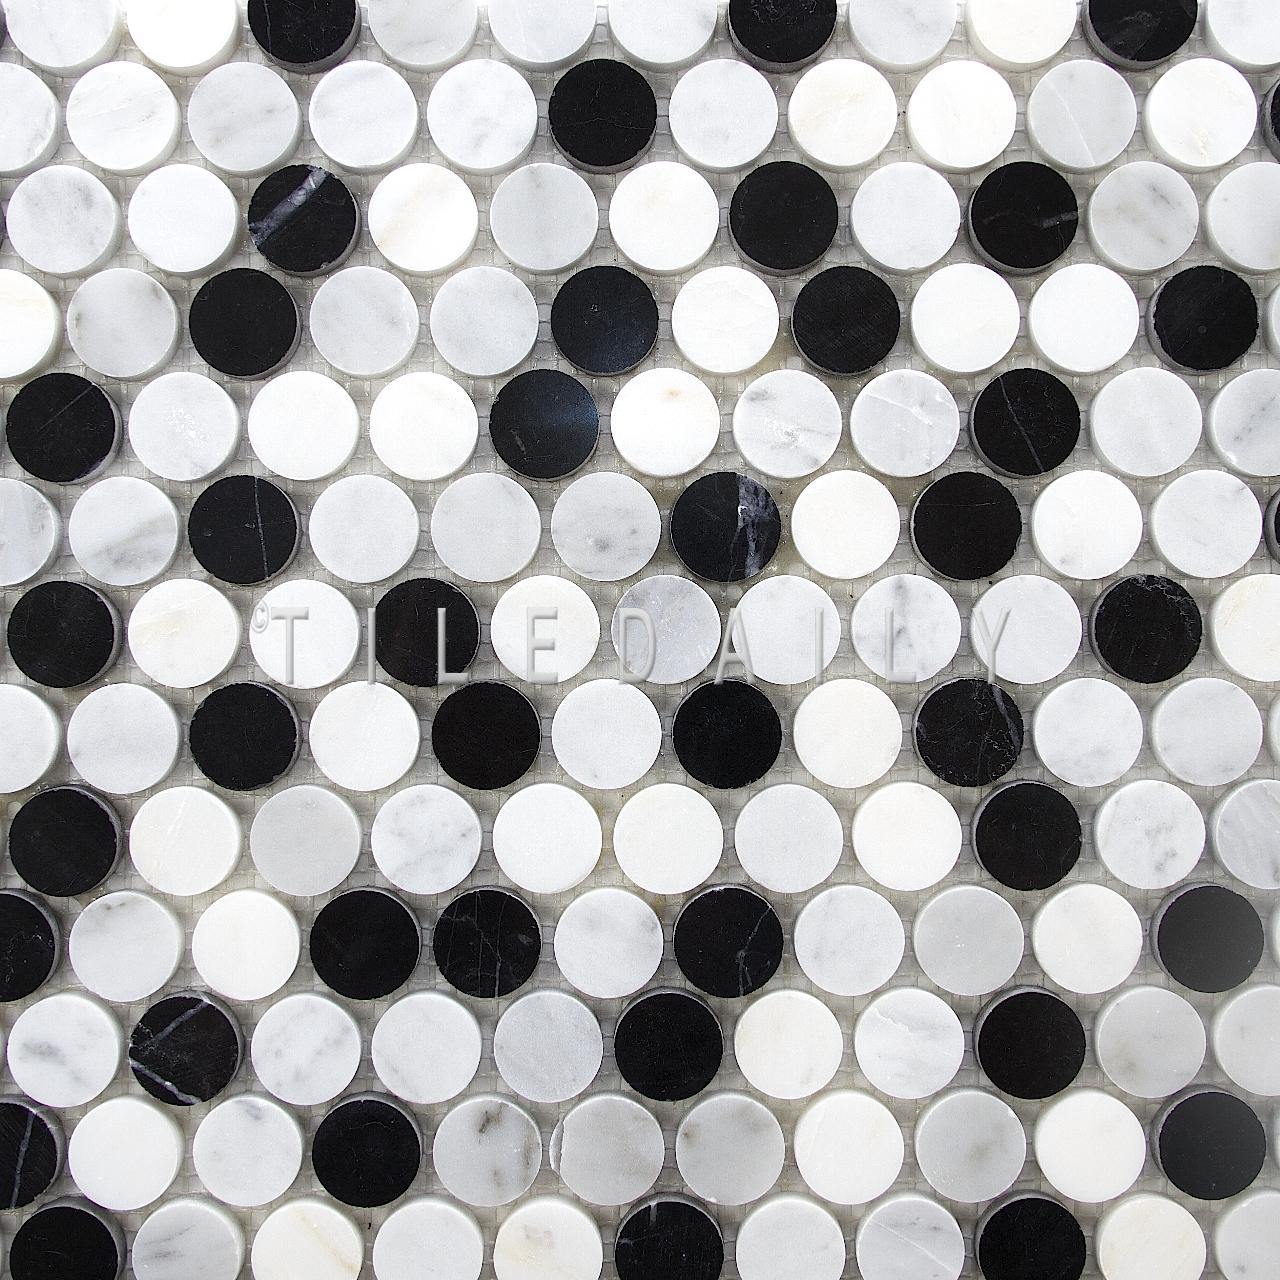 NS0043BK - Marble Penny Round Mosaic, Mix Black